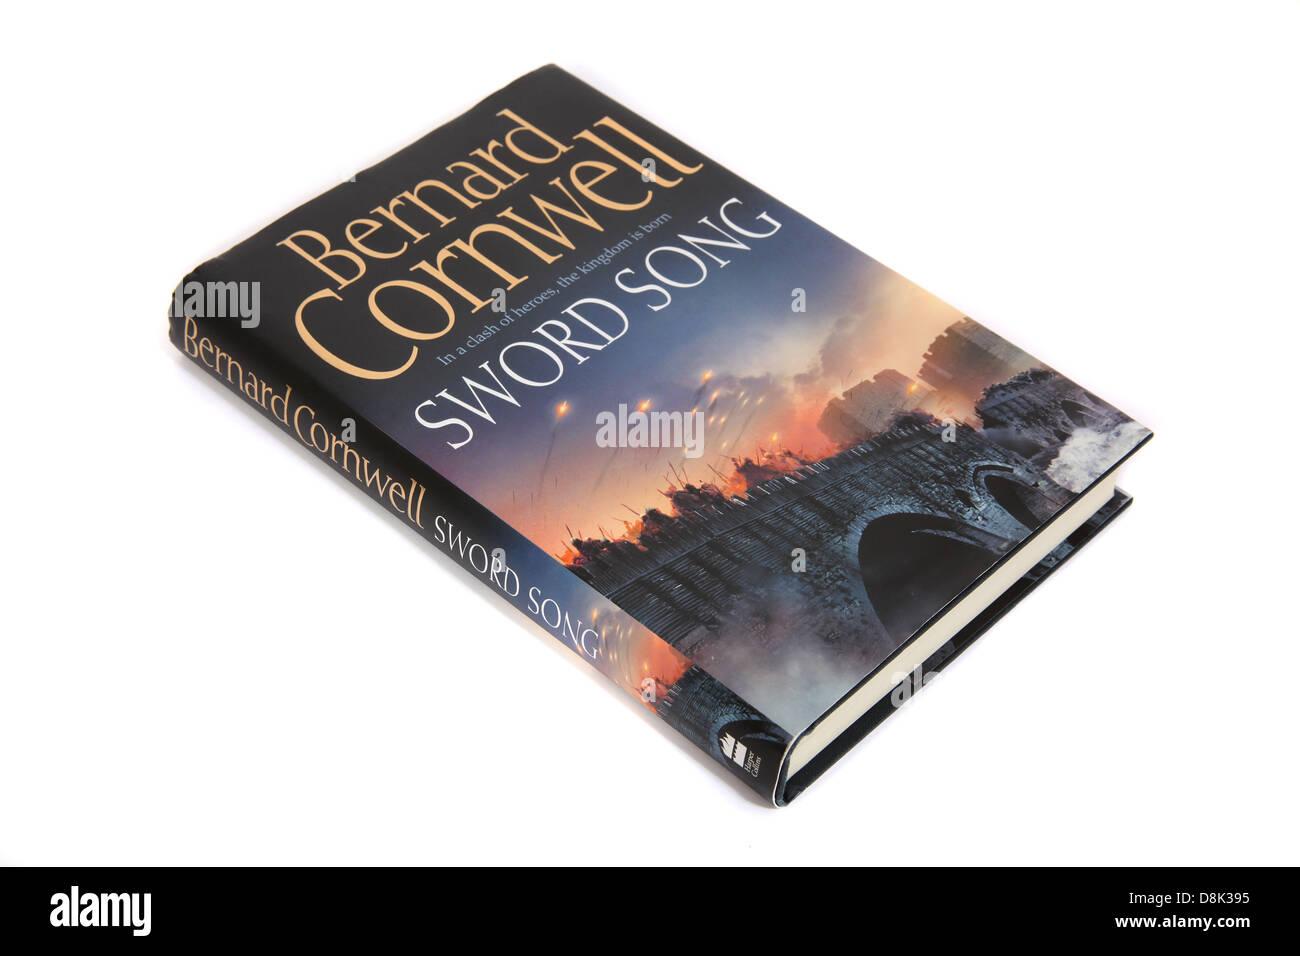 La novela - Canción espada por Bernard Cornwell Foto de stock